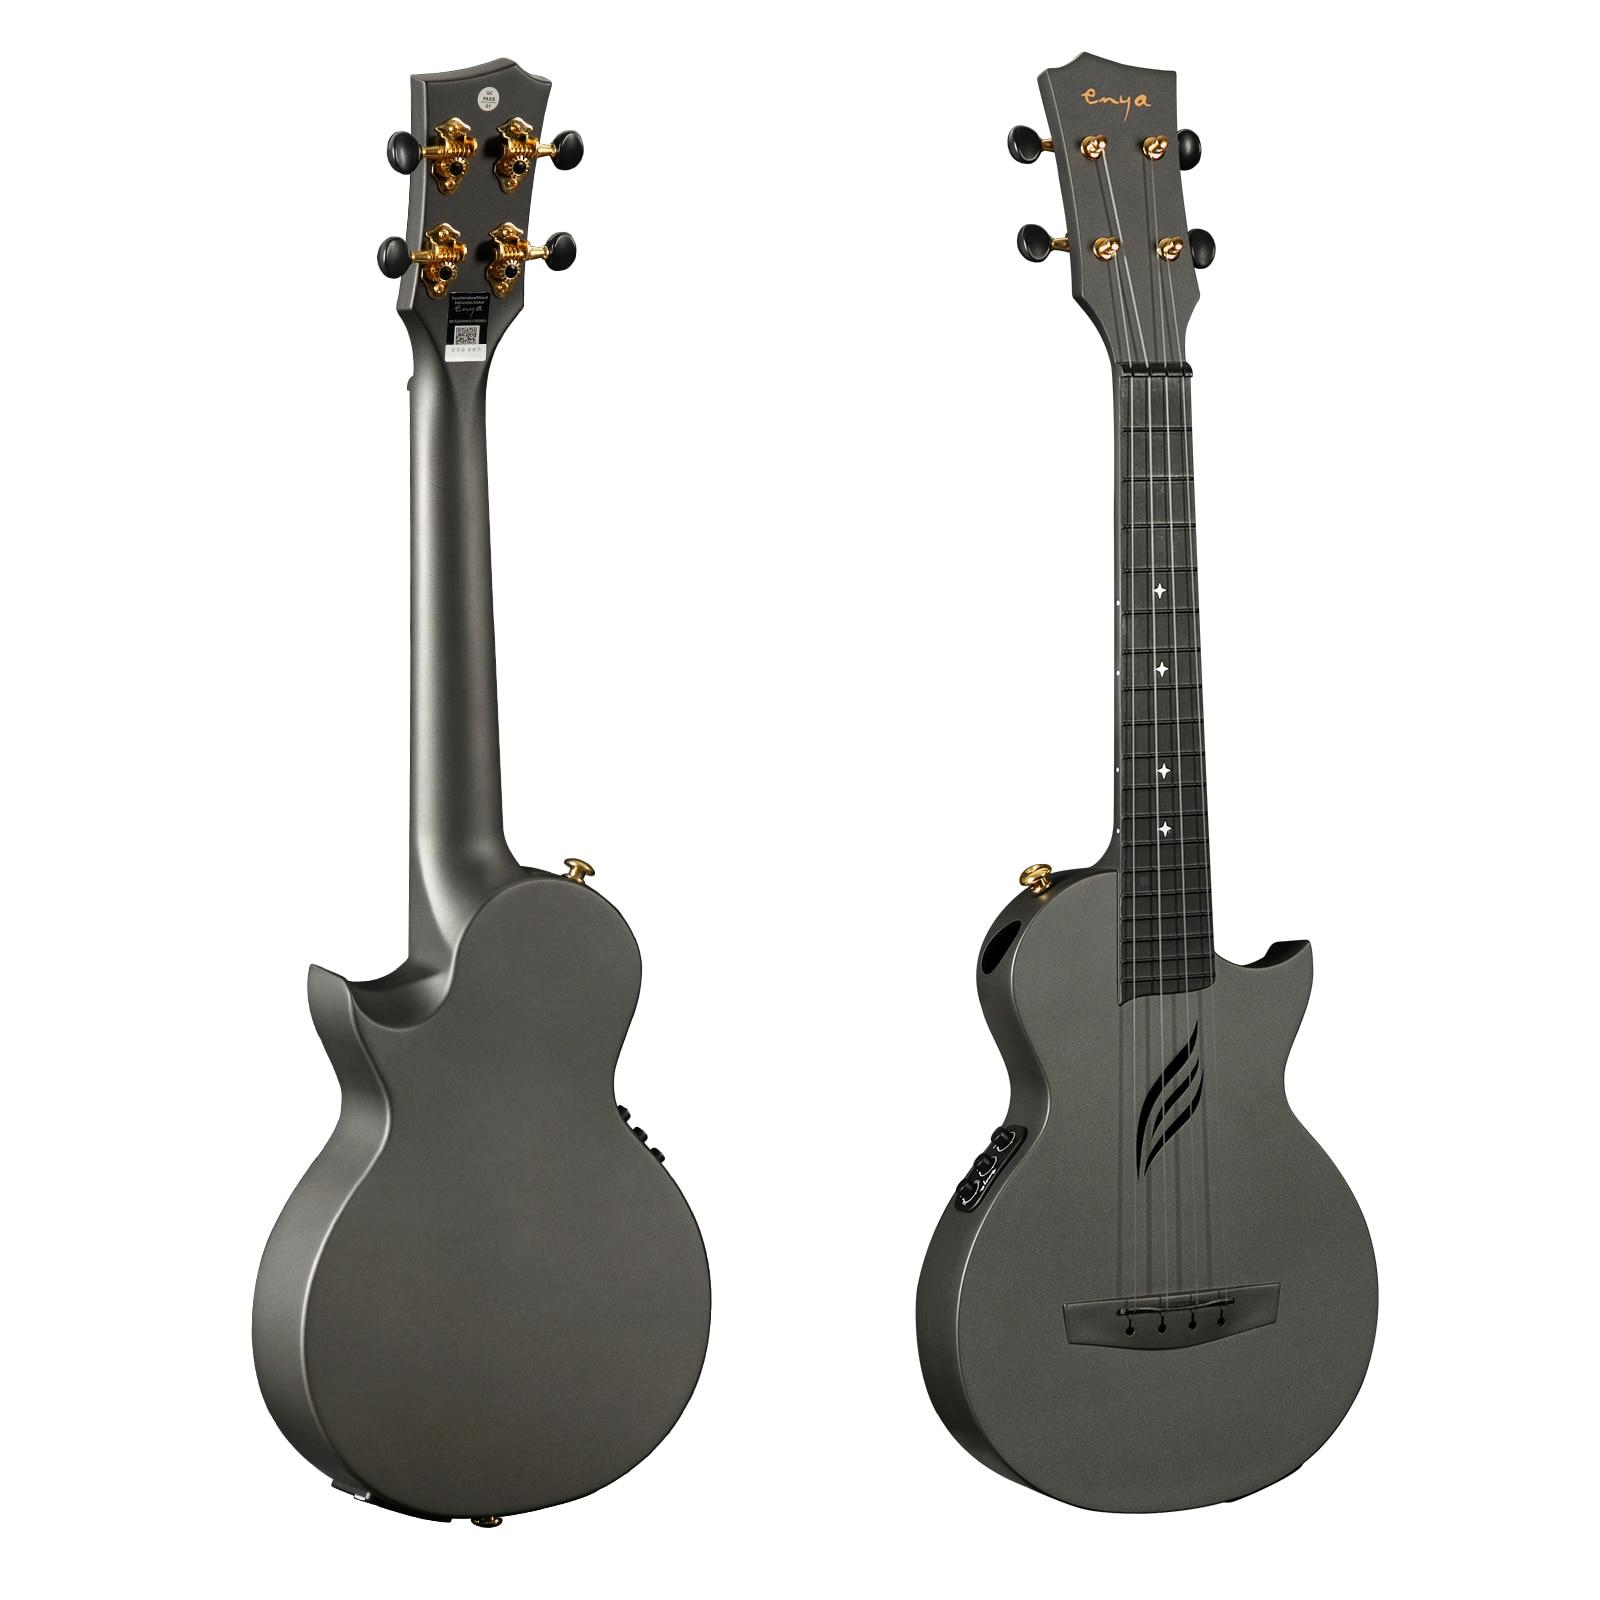 Enya Ukulele Concert NOVA U Carbon Fiber Electric Music Instrument Ukelele Kit Hawaii Mini Guitar with Pickup Case Strap Capo enlarge